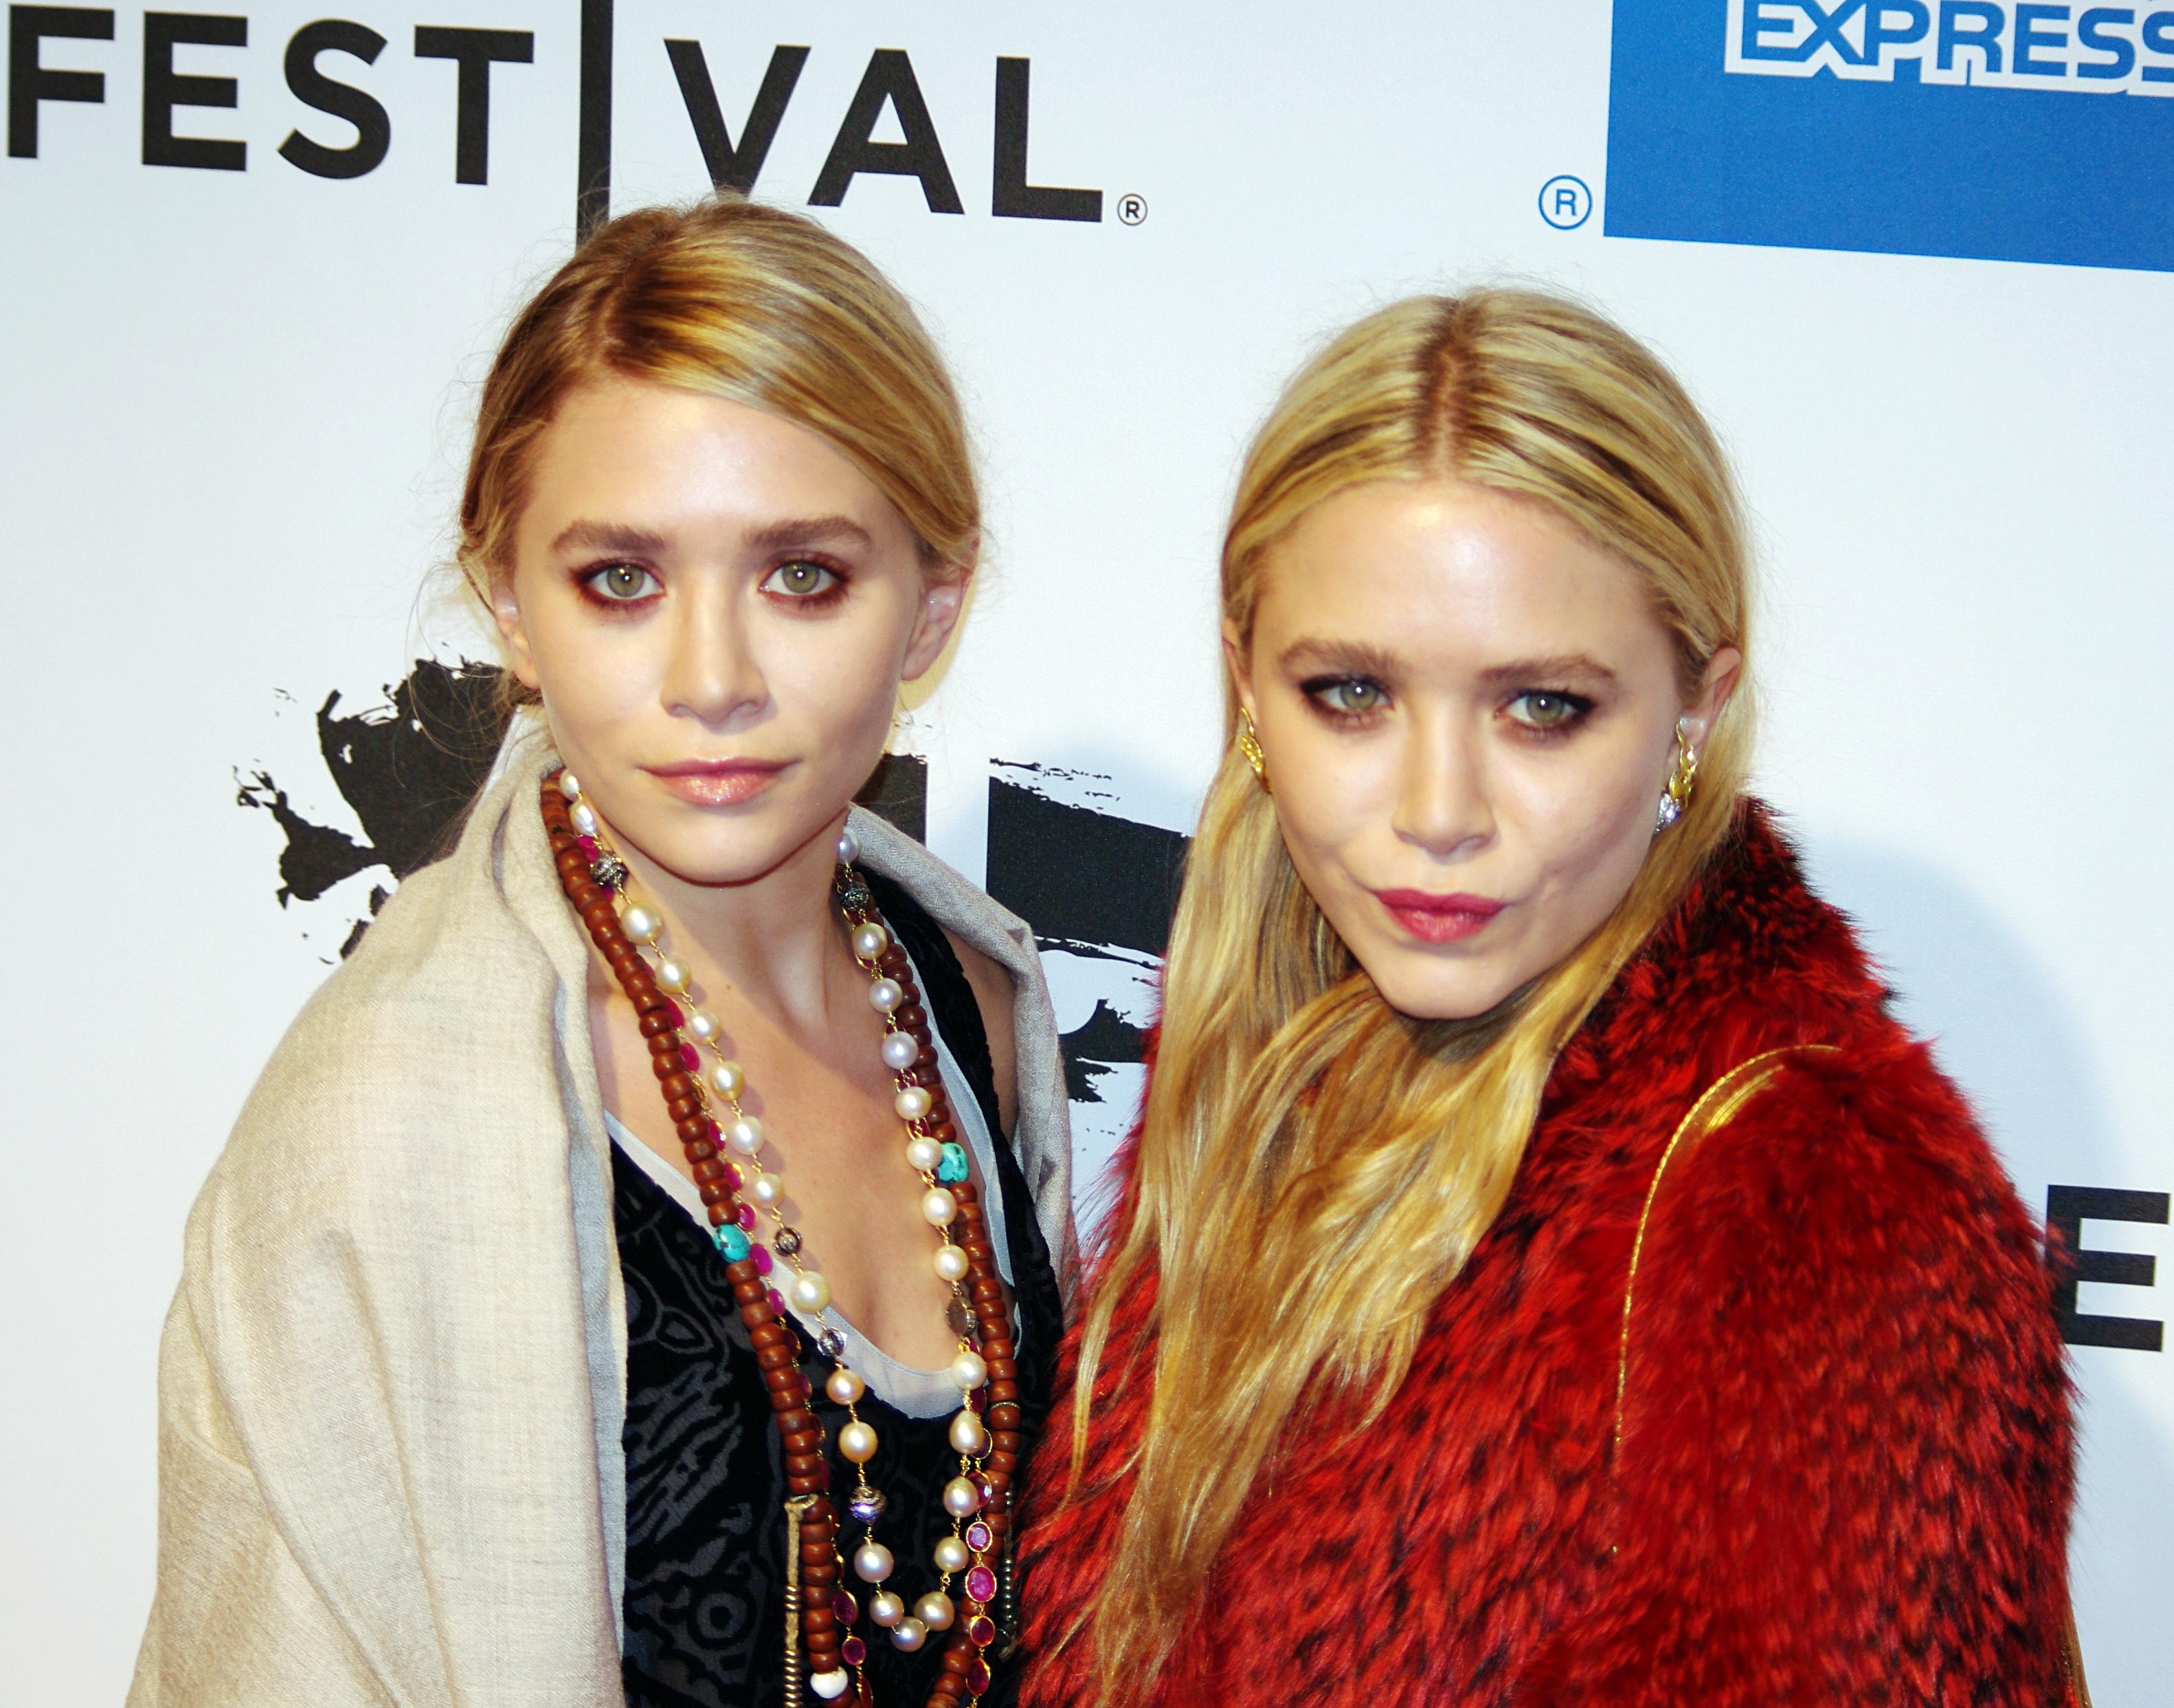 Olsen Twins Full House Fashion Influence